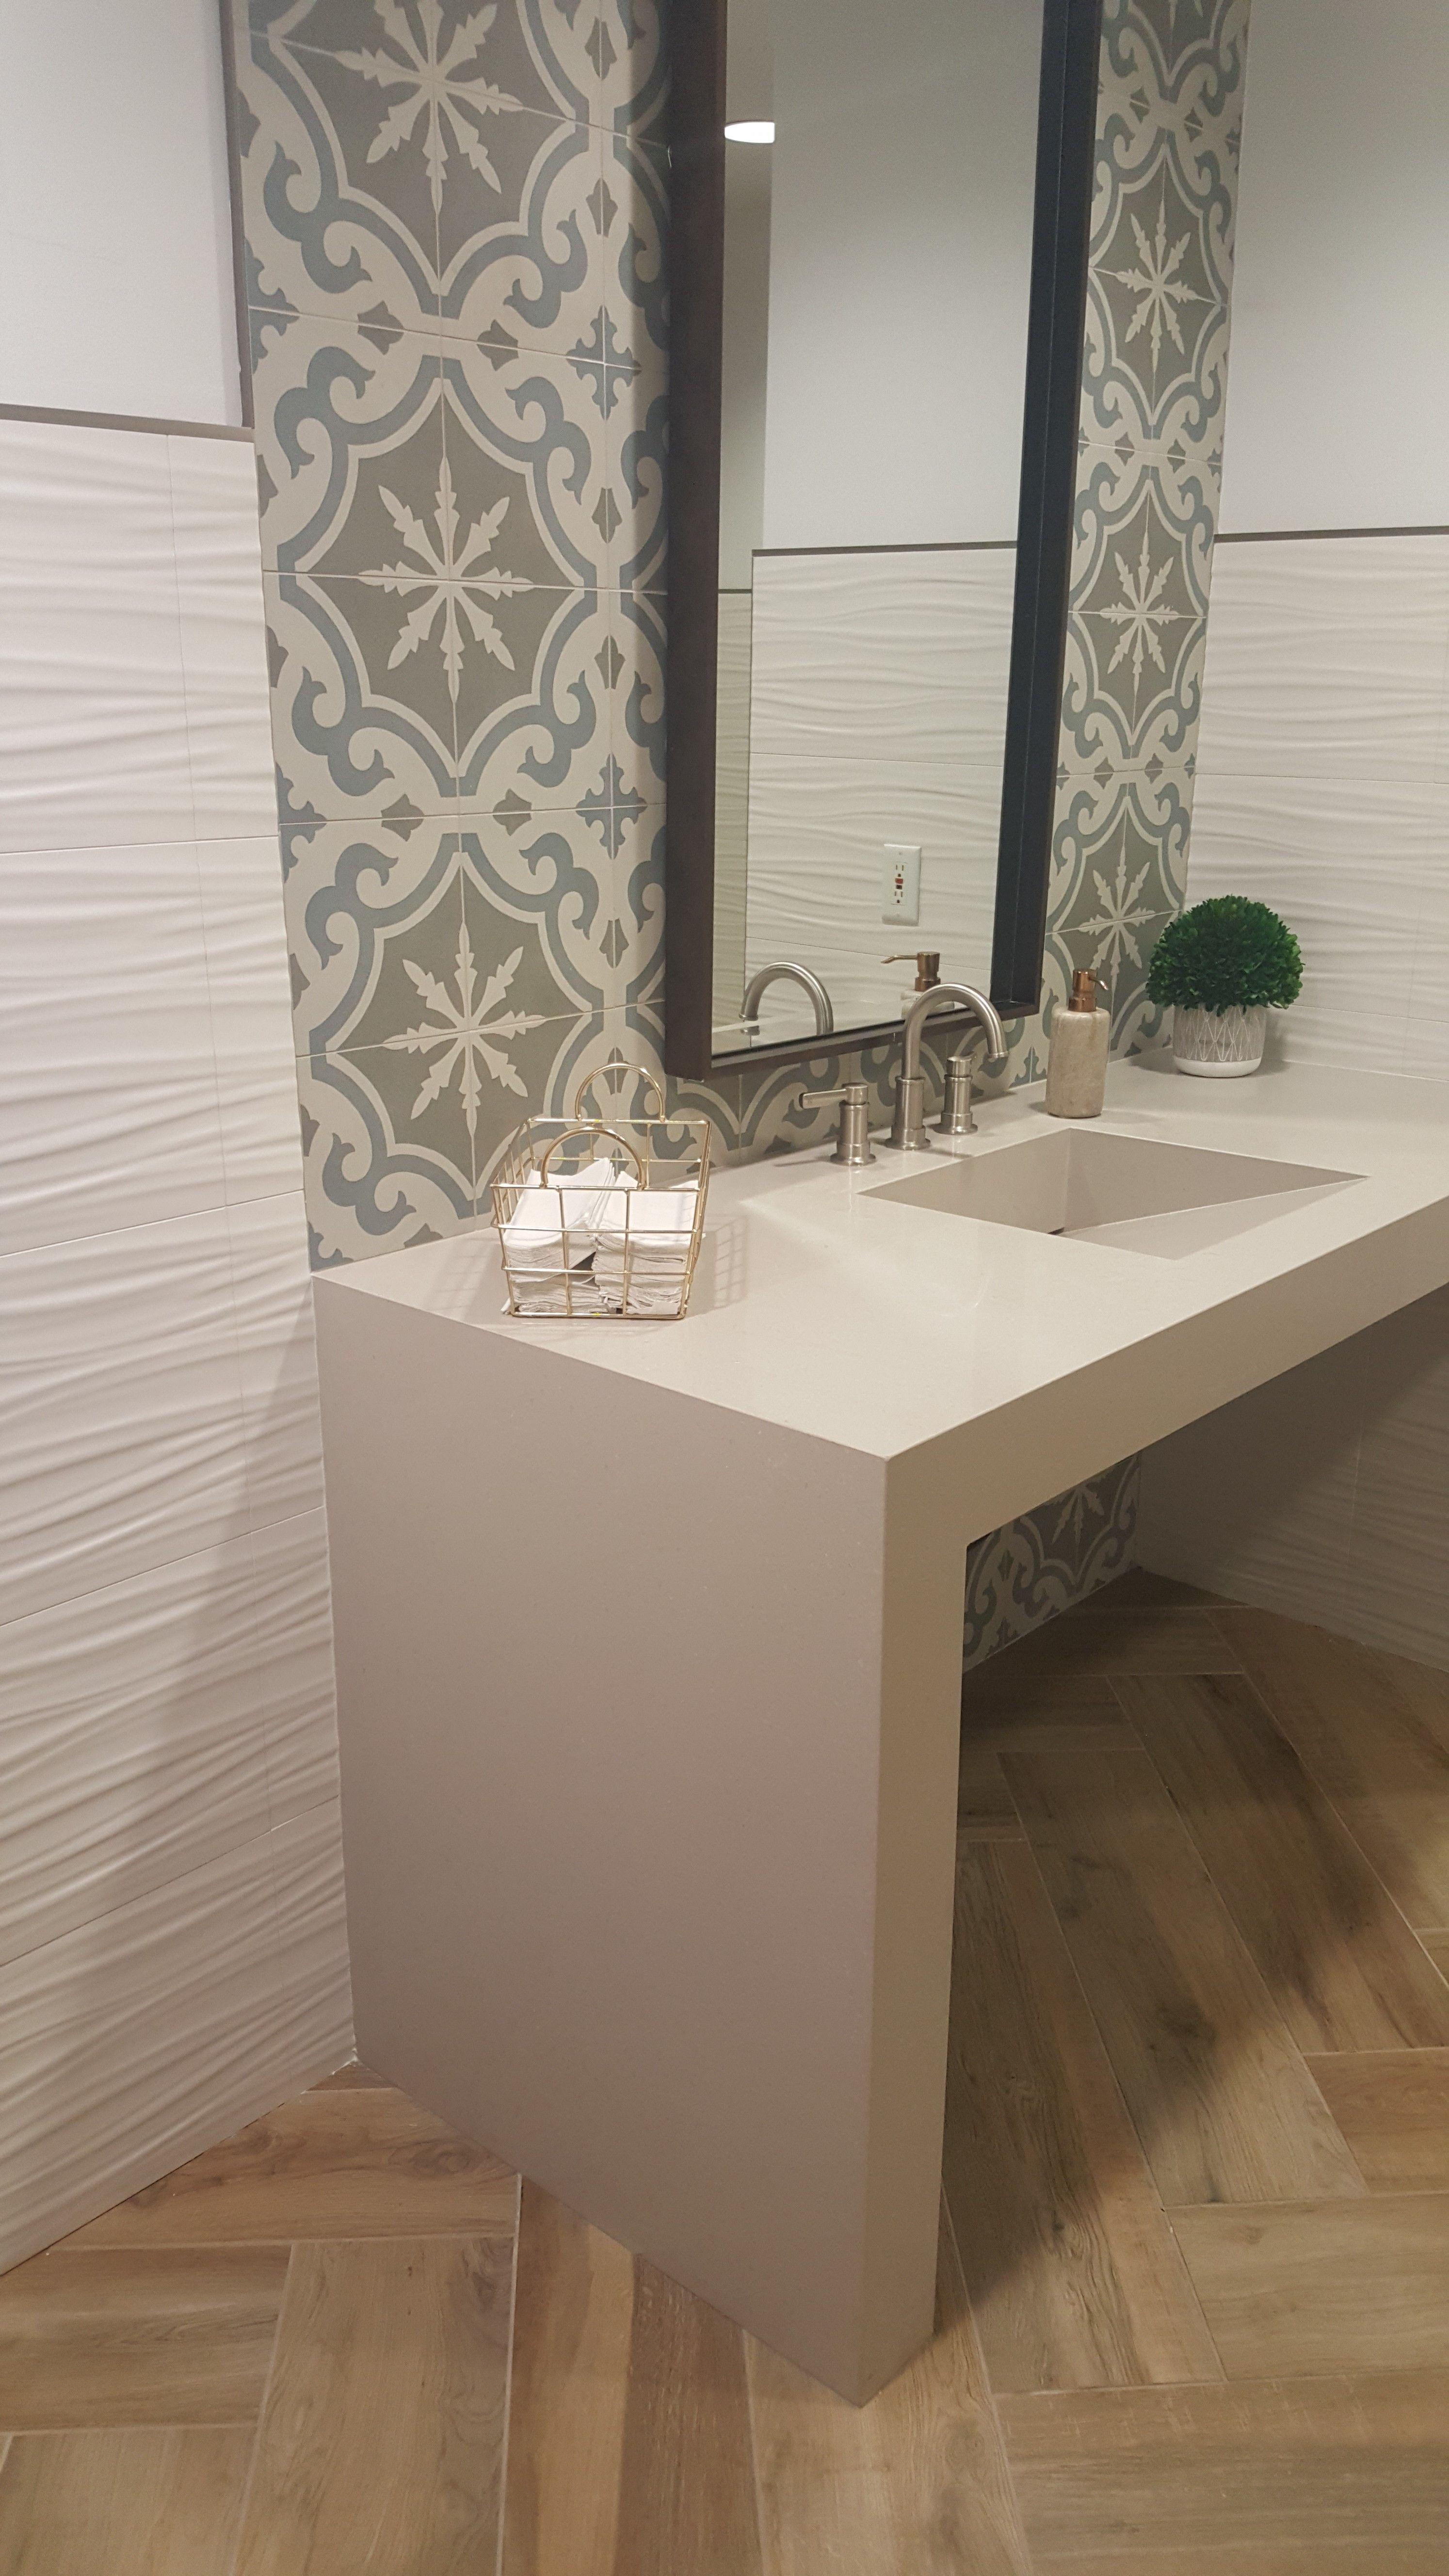 A Fantastic Bathroom Update In Salt Lake City With Great Use Of Our Aequa Quartz Tiacksplash